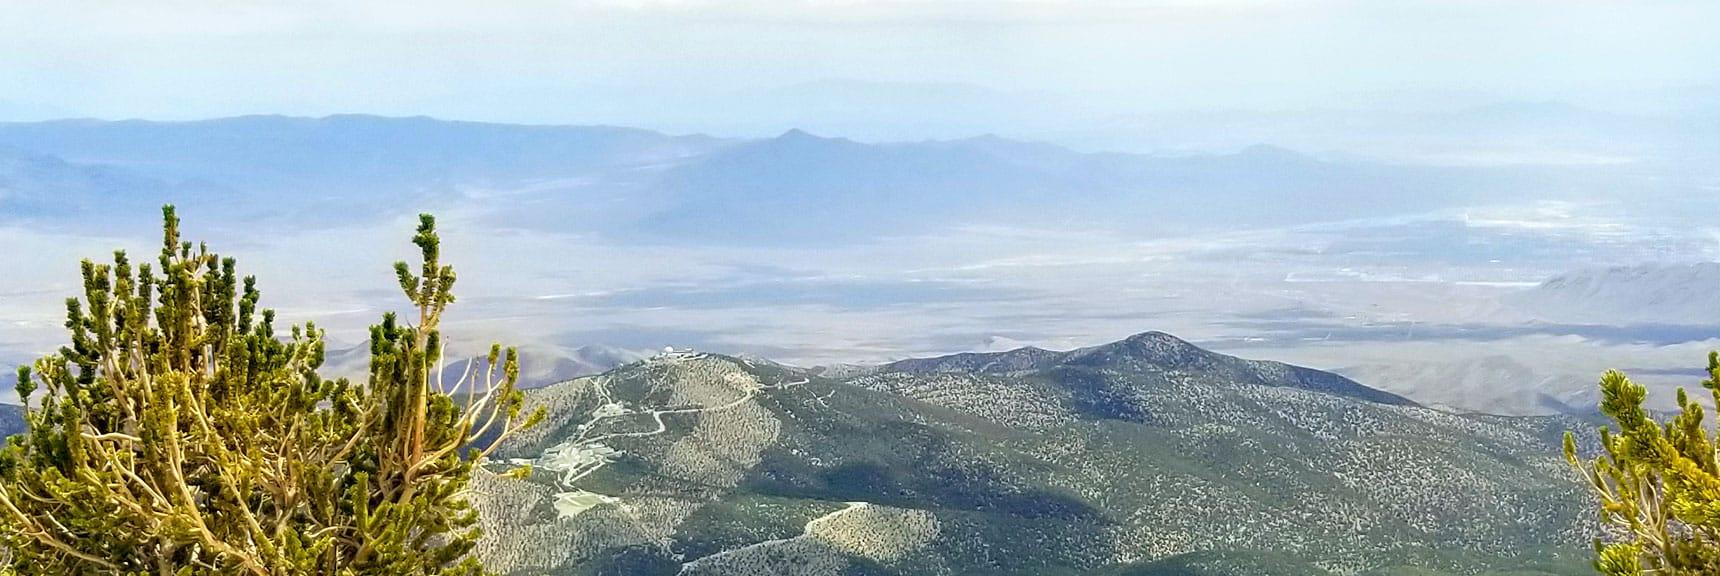 Gass Peak Viewed from Mummy Mountain Summit